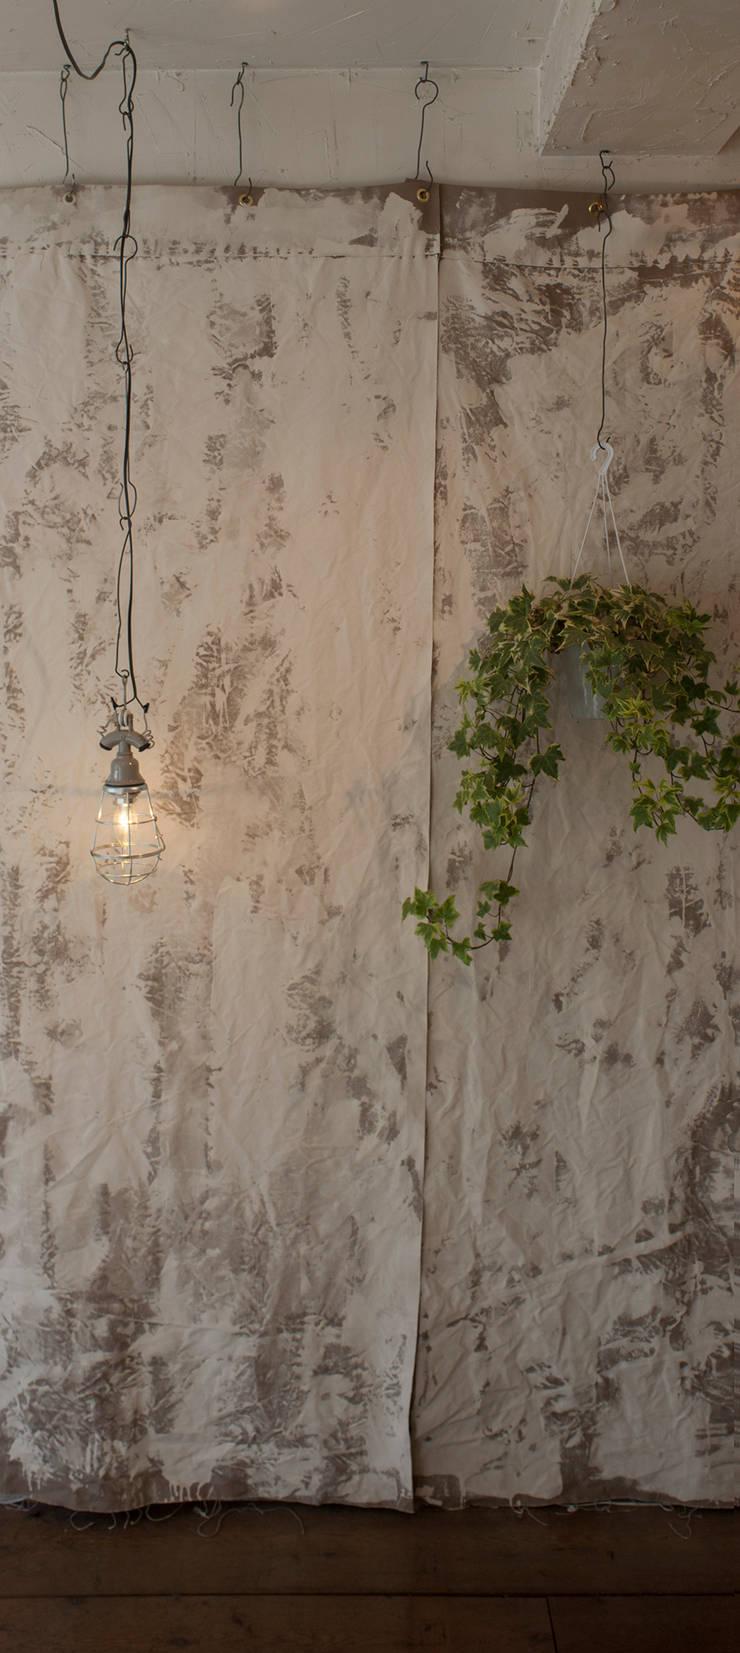 Lien hair atelier: トロッコ一級建築士事務所が手掛けたオフィススペース&店です。